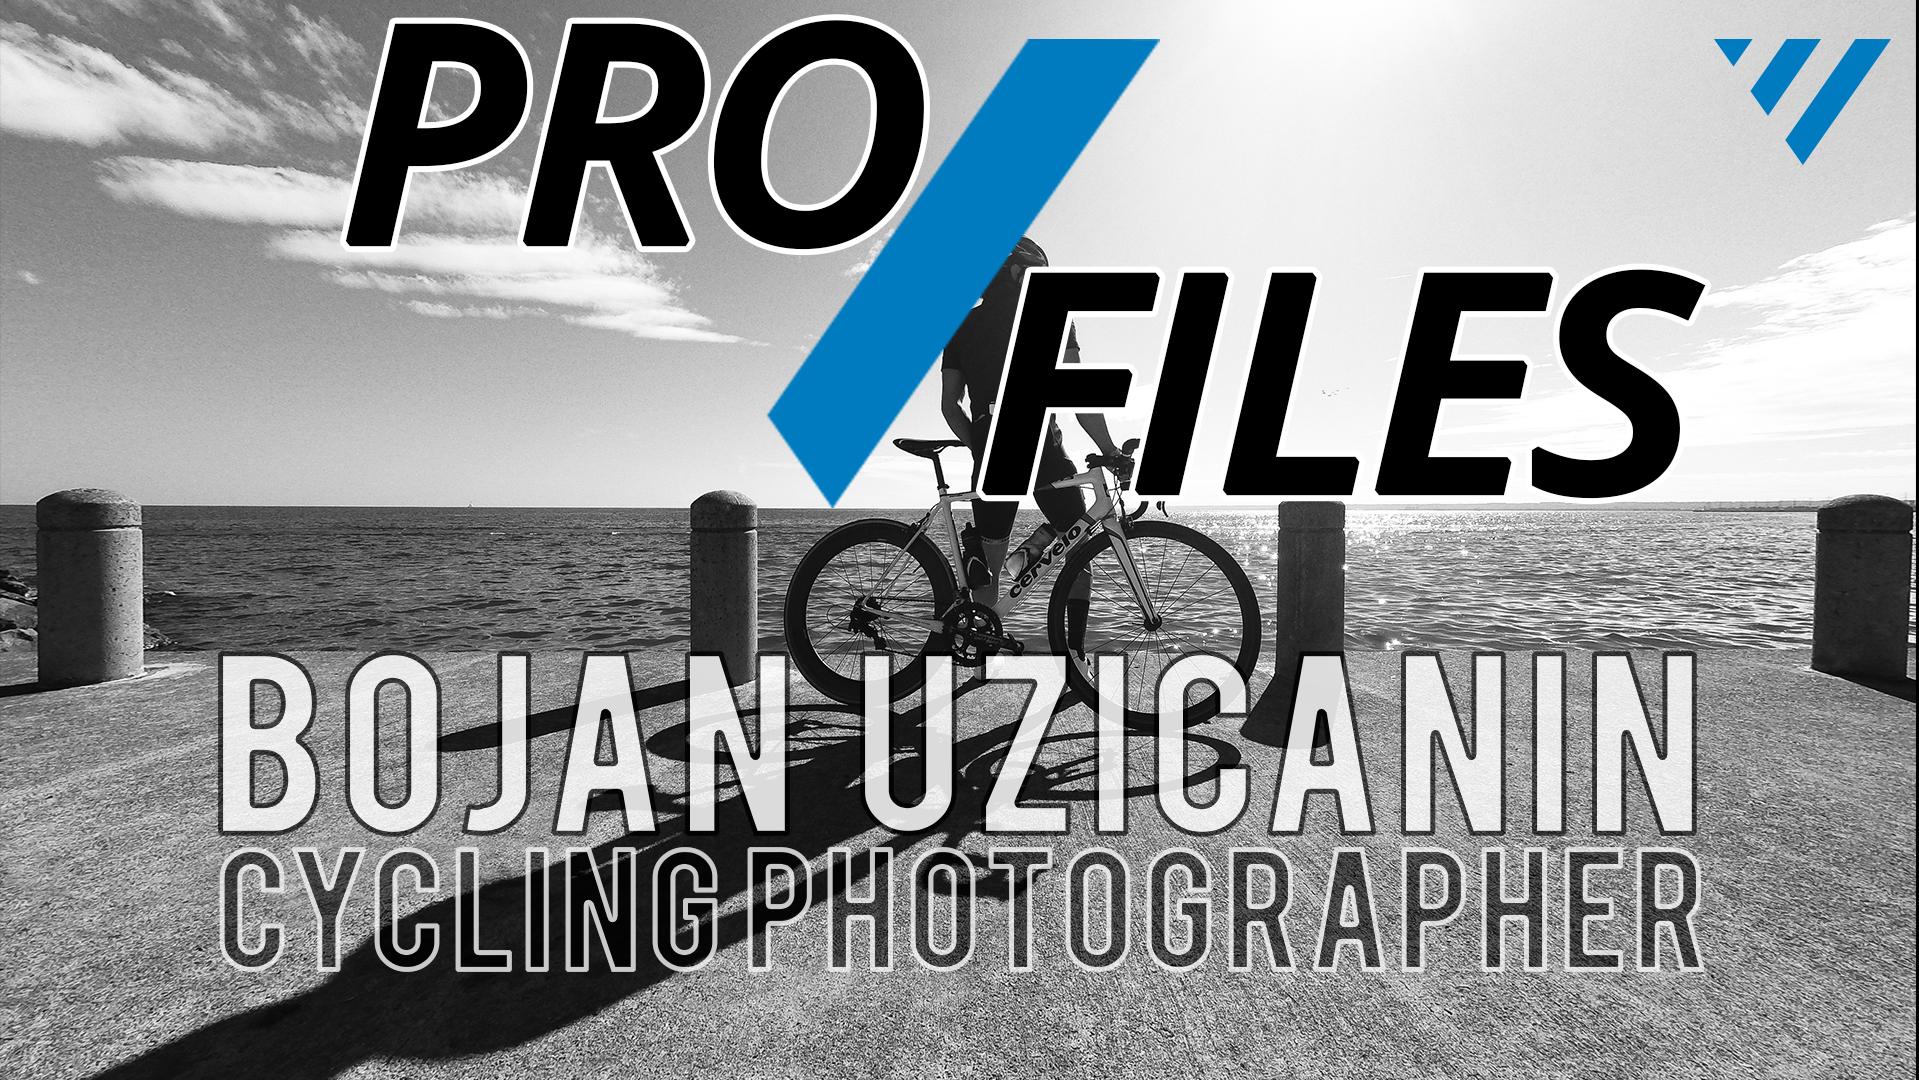 Pro/Files EP1 – Bojan Uzicanin